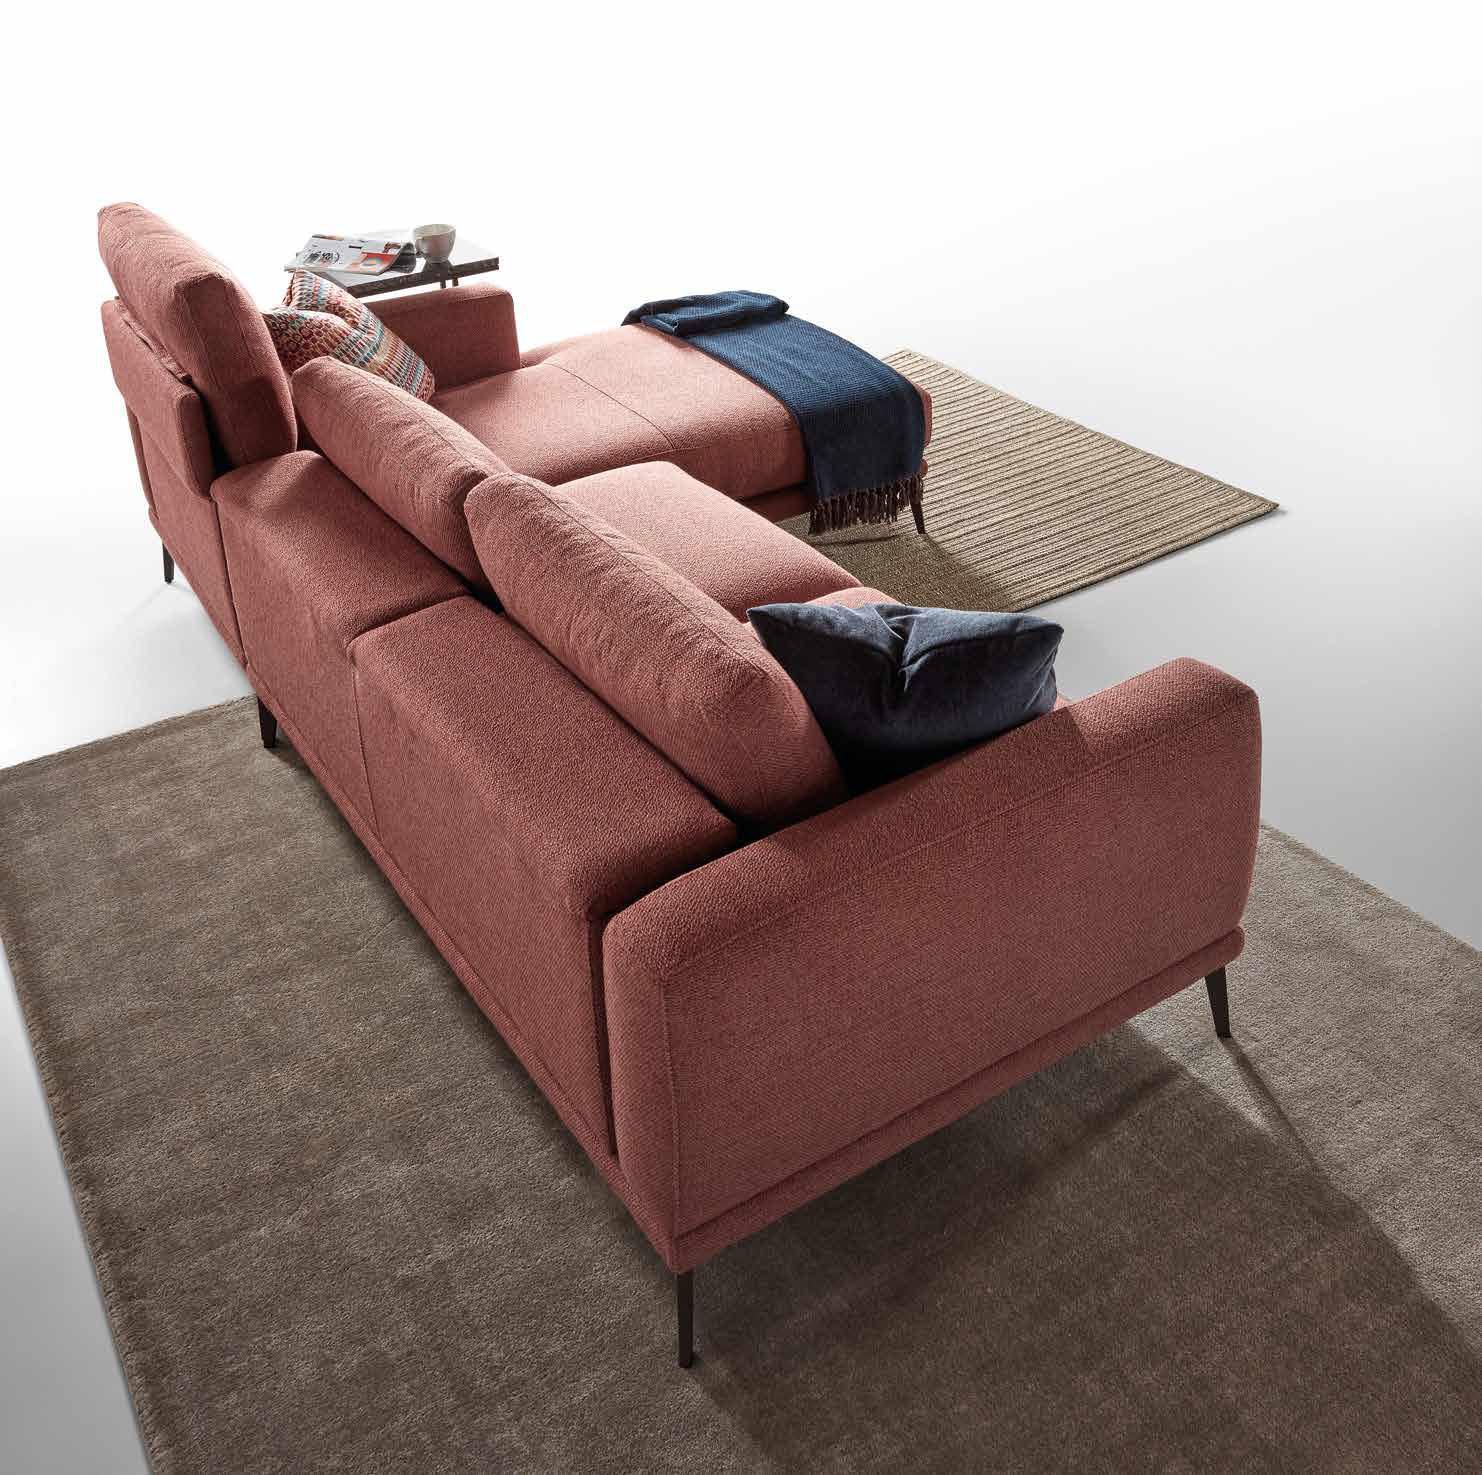 sofa-detalle-Berlin